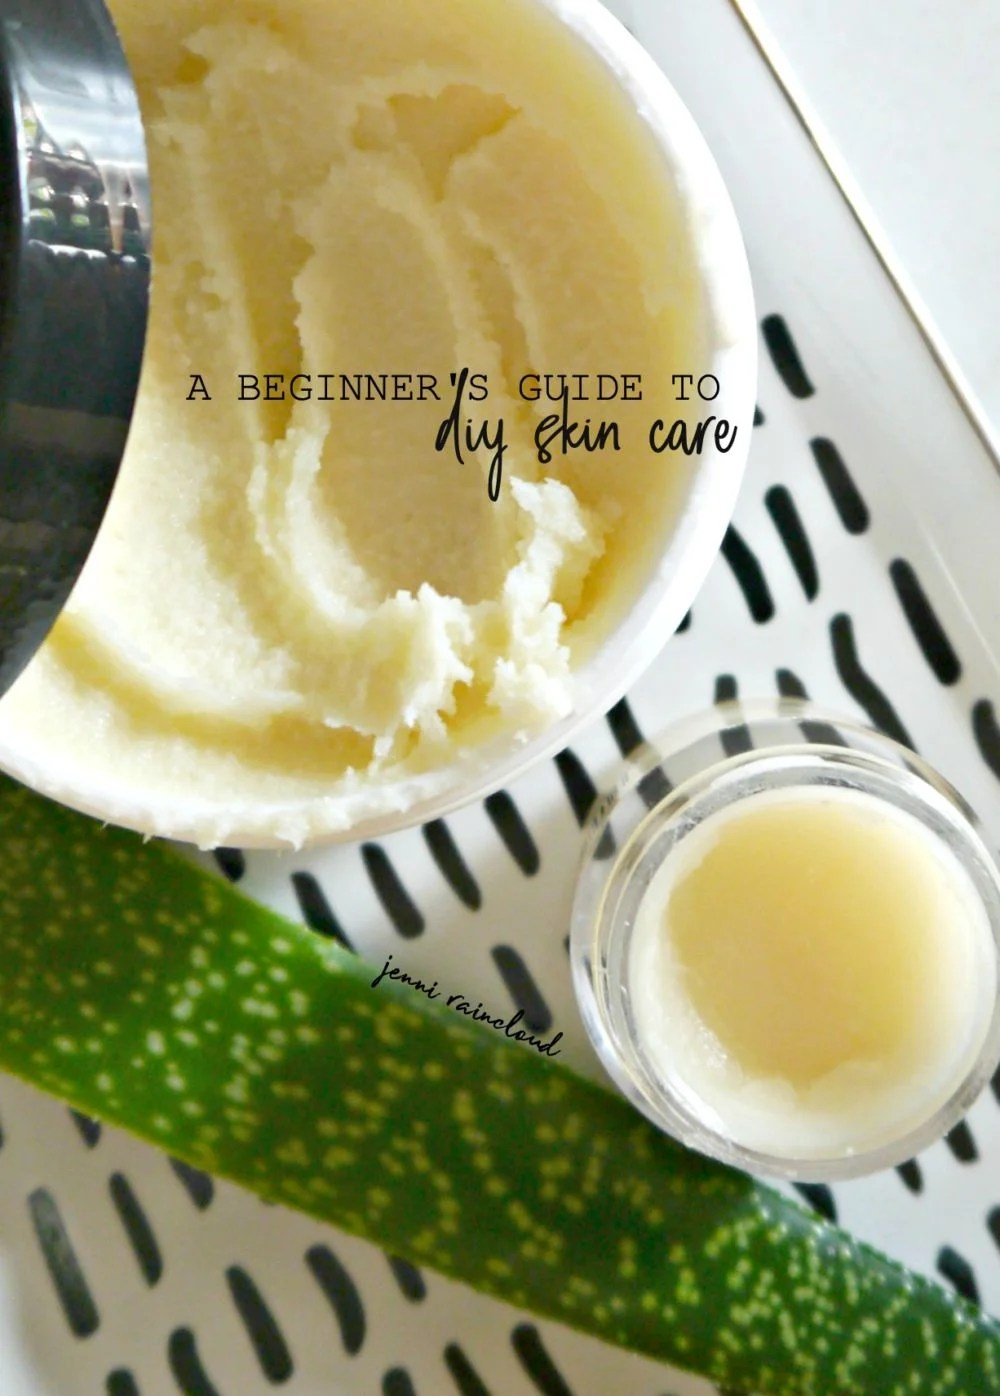 Beginner's Guide to DIY Skin Care